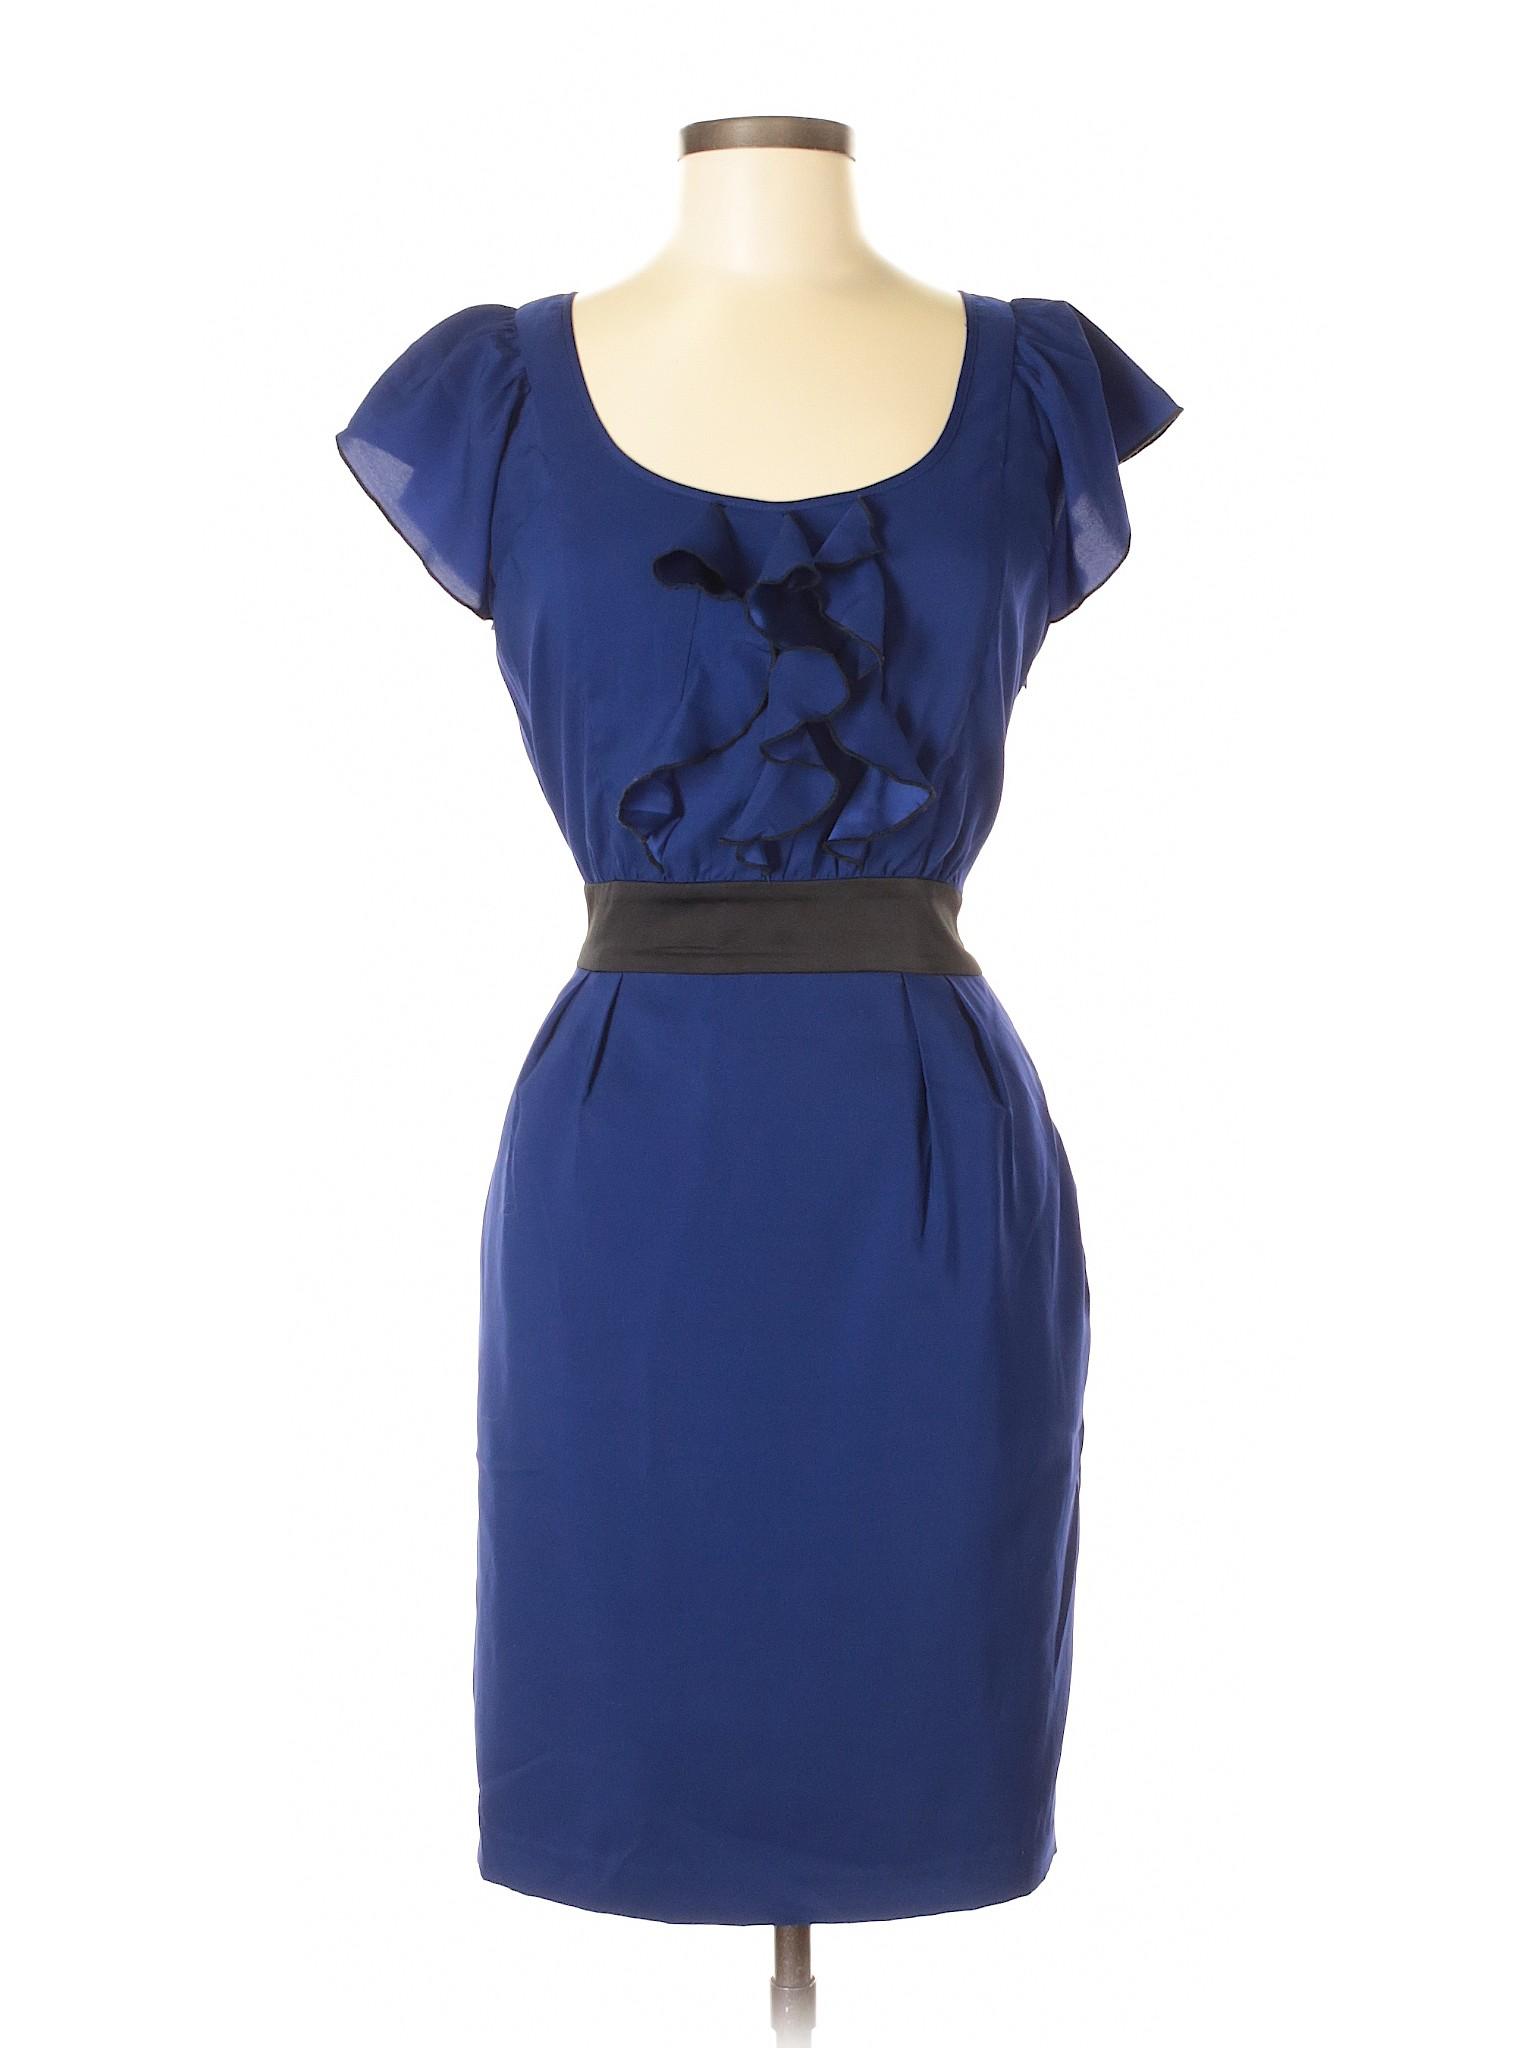 Boutique Dress Express Boutique Winter Casual Winter 4TnSqwY5cn